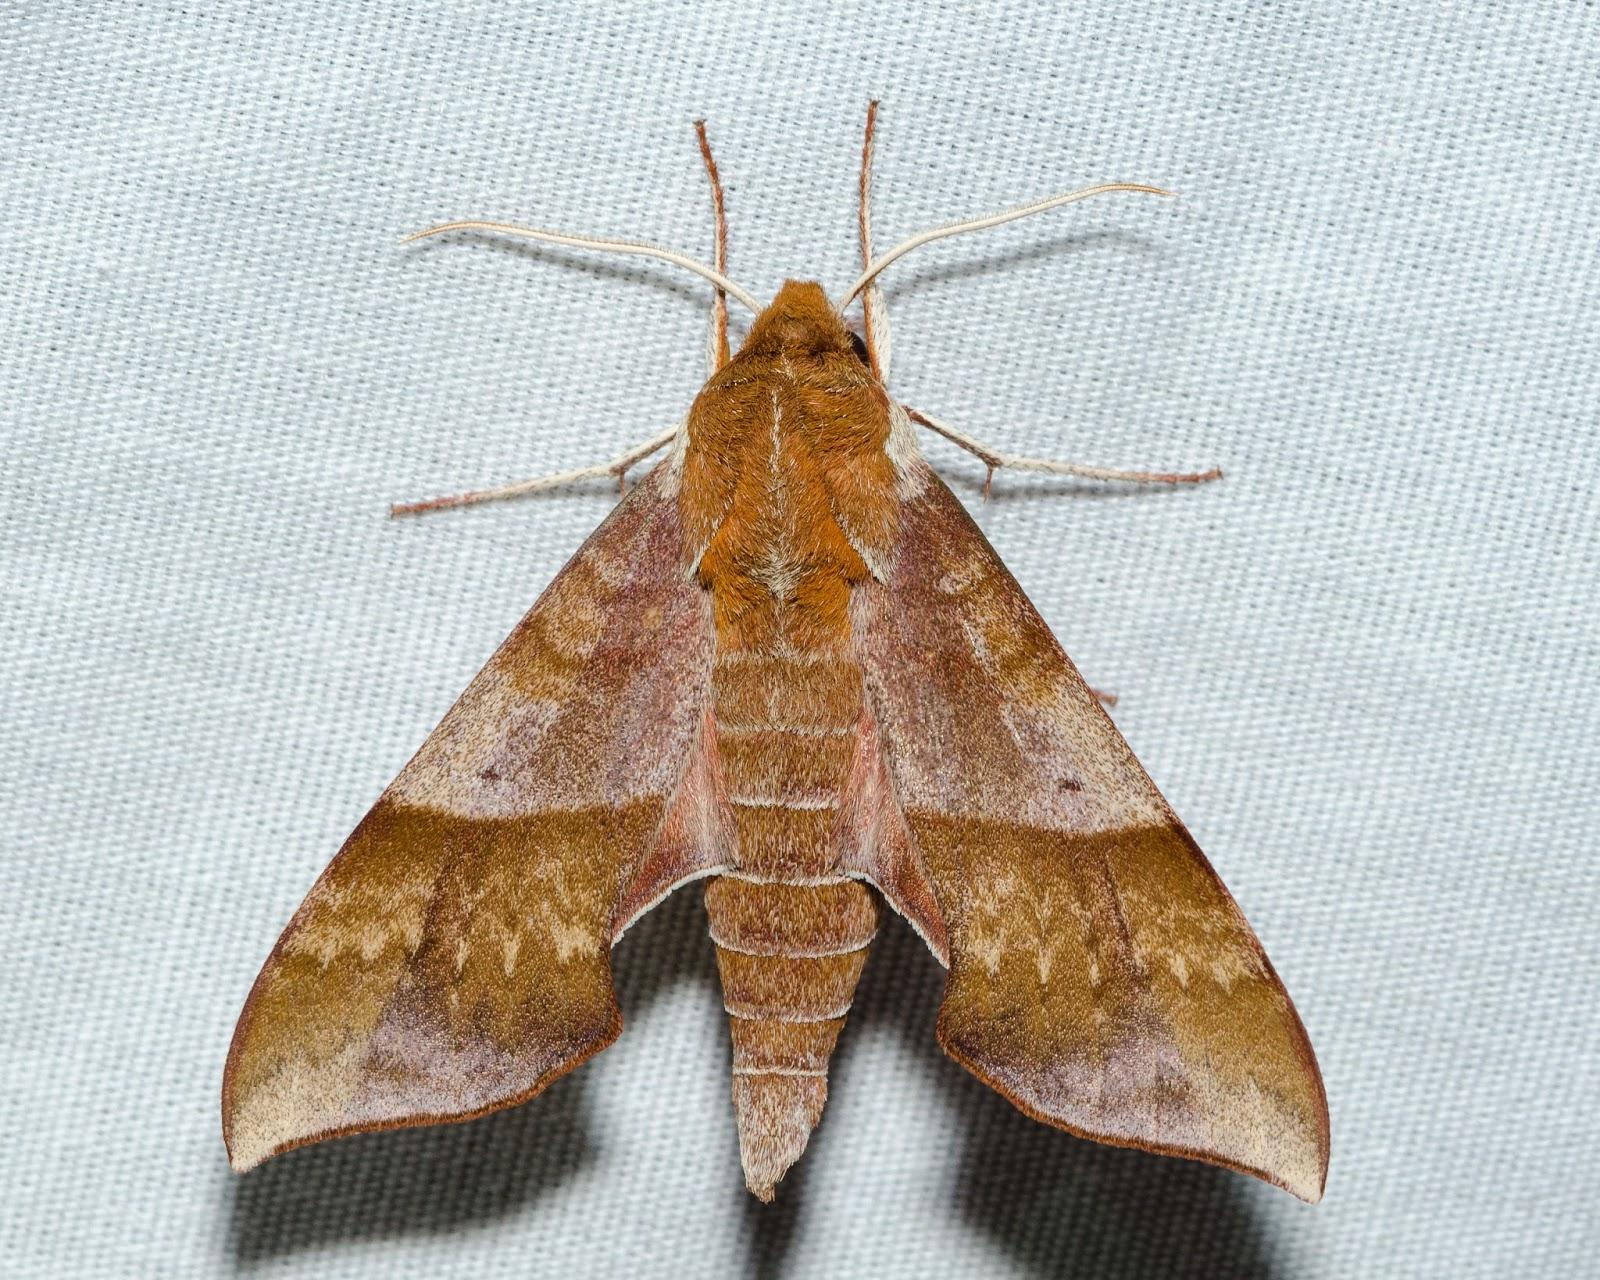 Azalea Sphinx (Darapsa choerilus)